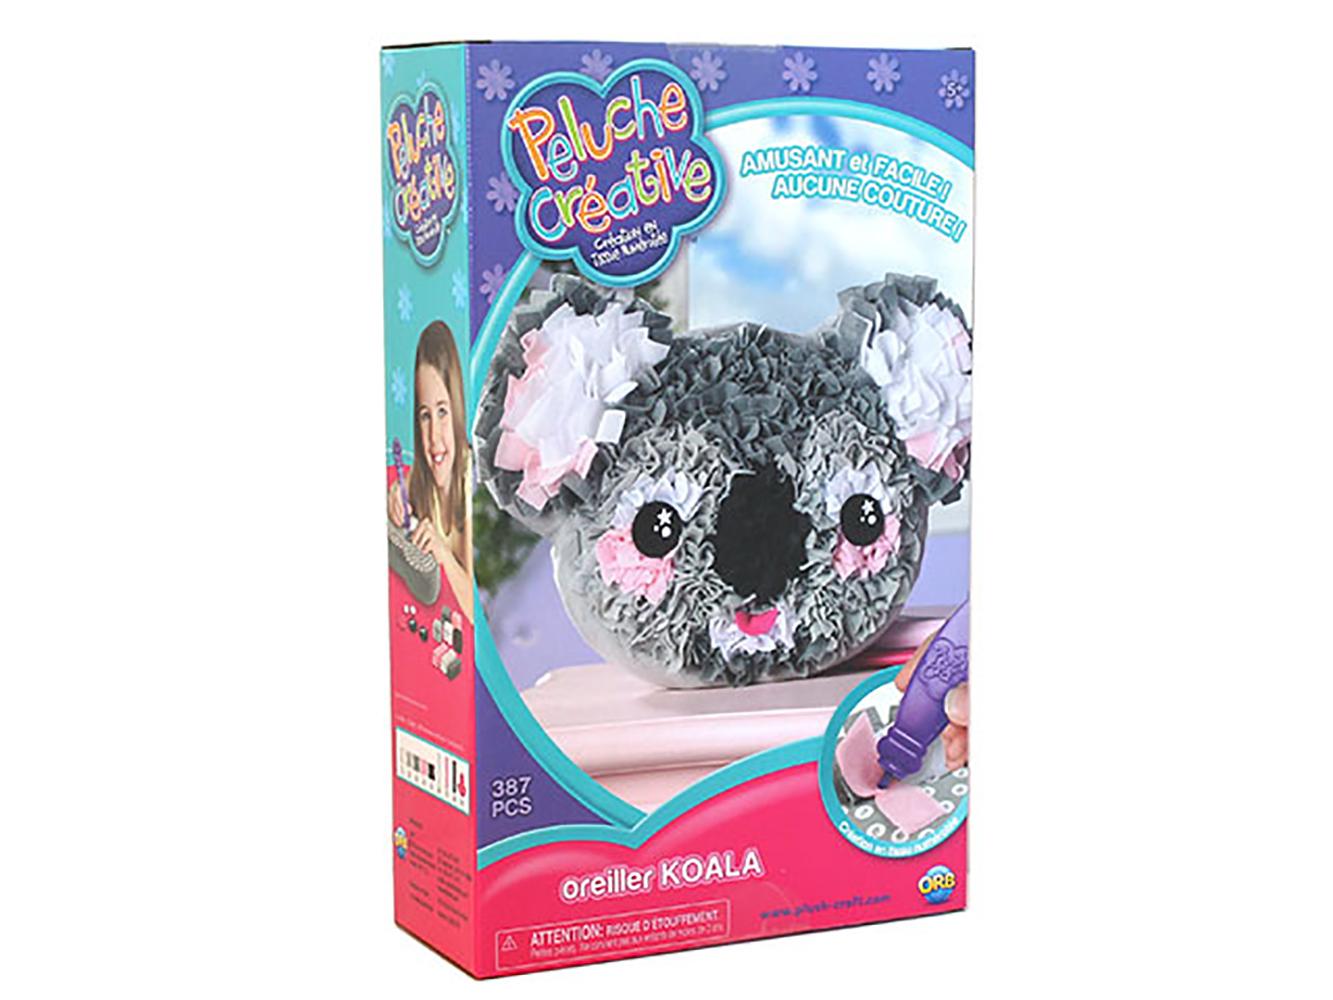 Peluche Créative - Coussin Koala